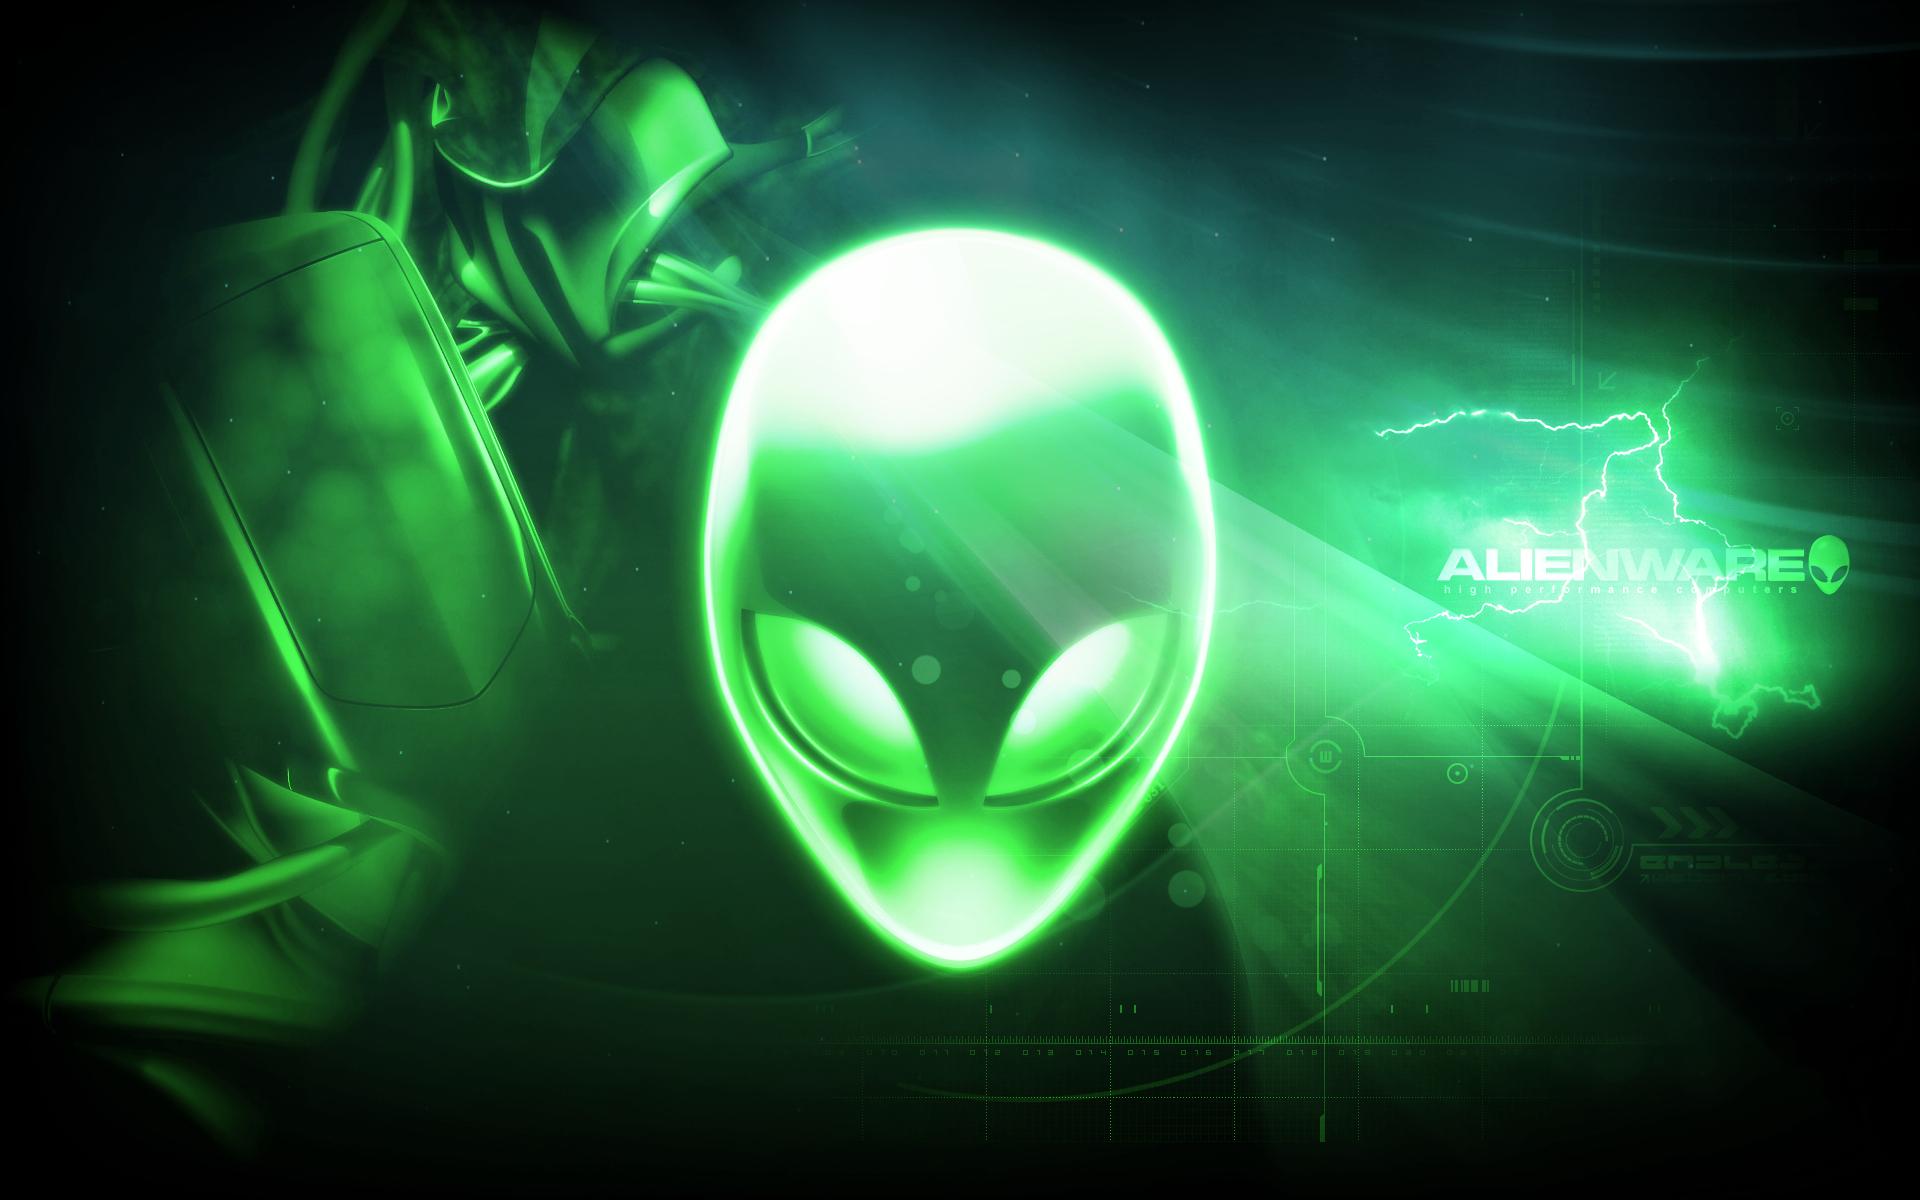 Promise Reloaded Alienware Desktop Green wallpapers HD   120791 1920x1200